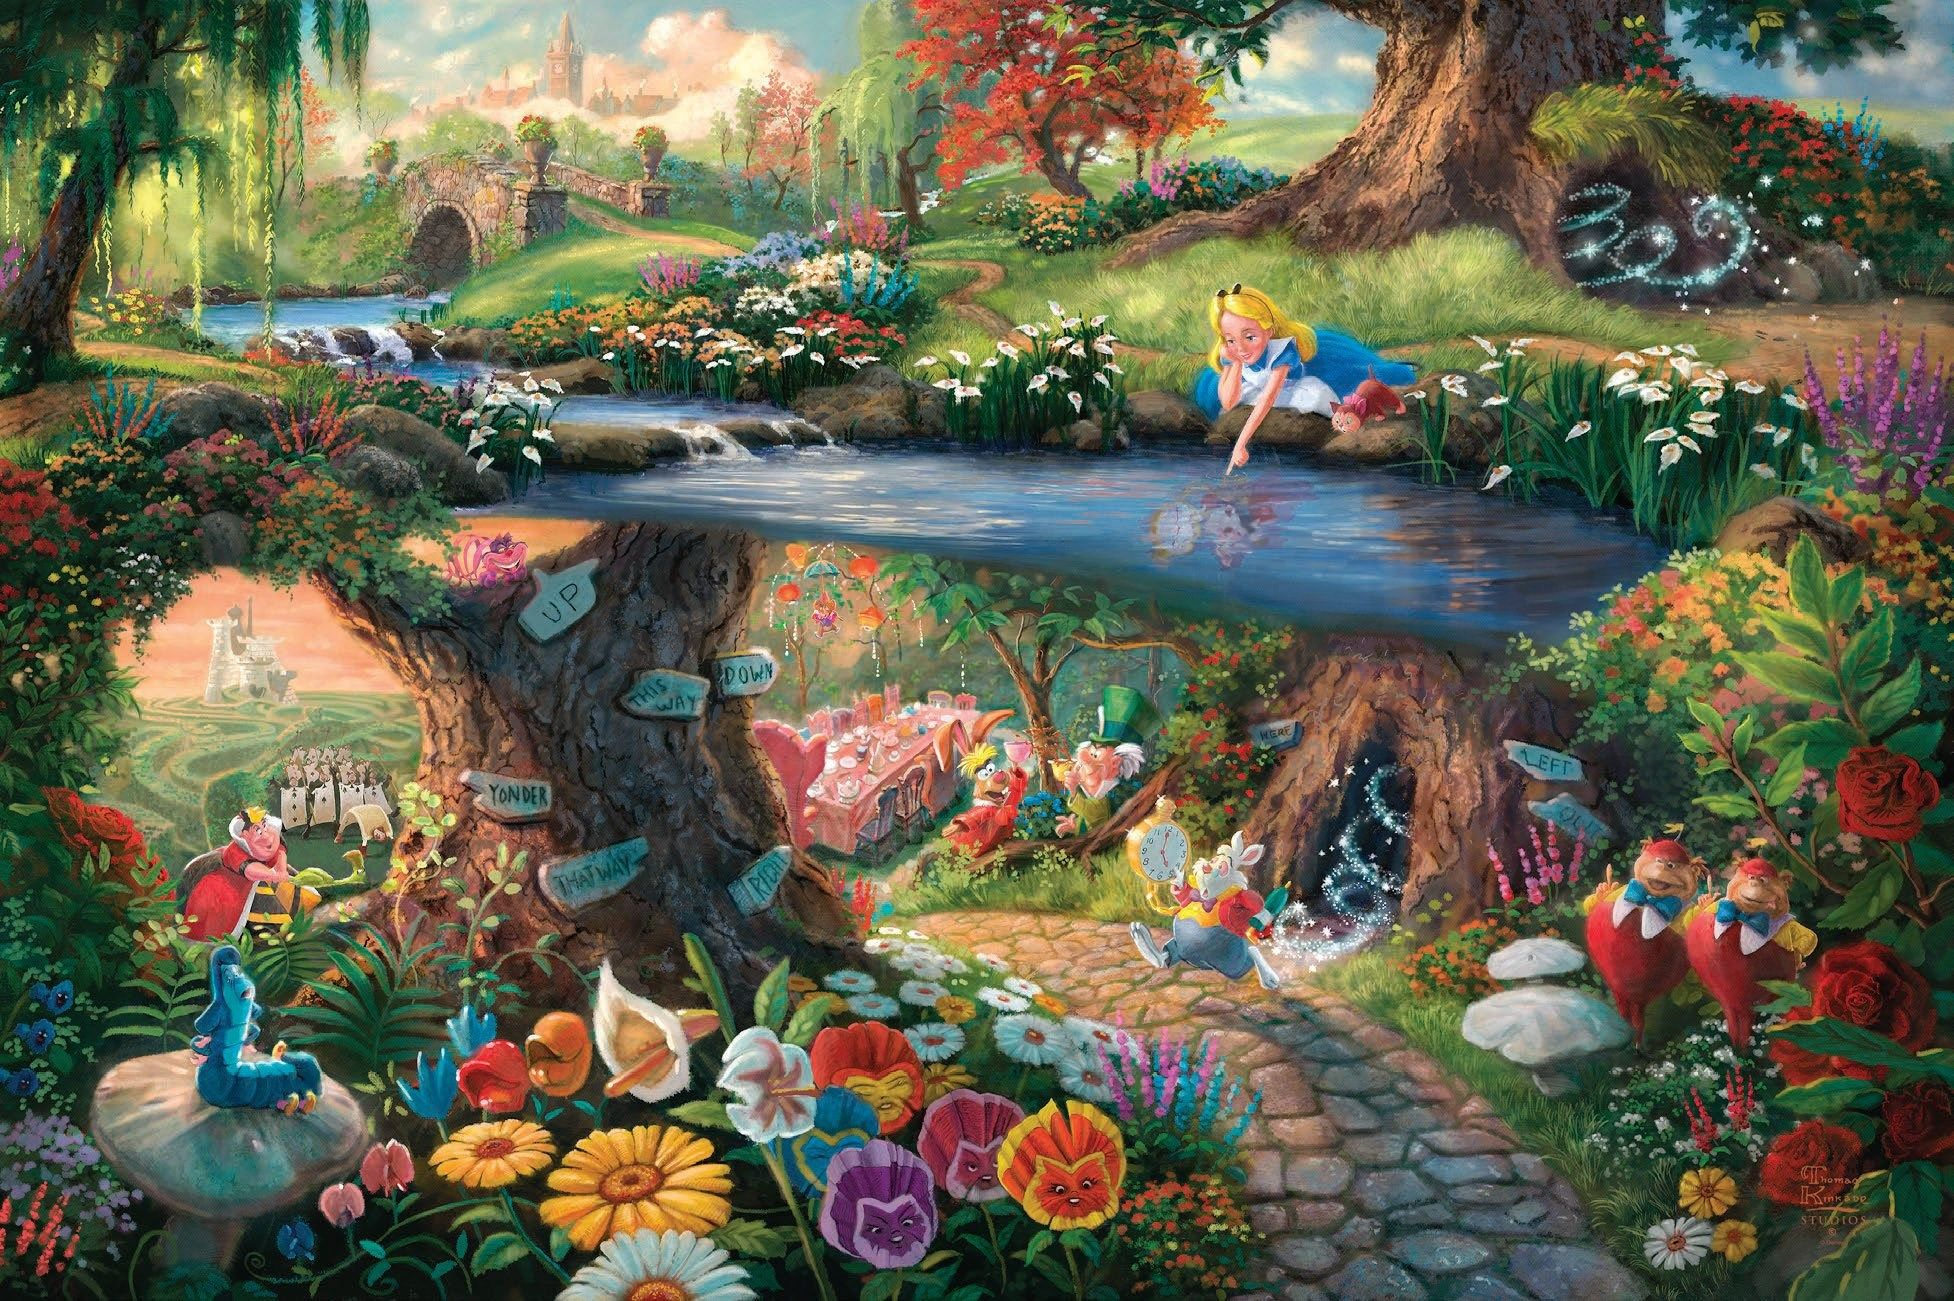 Kproject Alice in Wonderland wallpaper HD by ArcanachanHTH